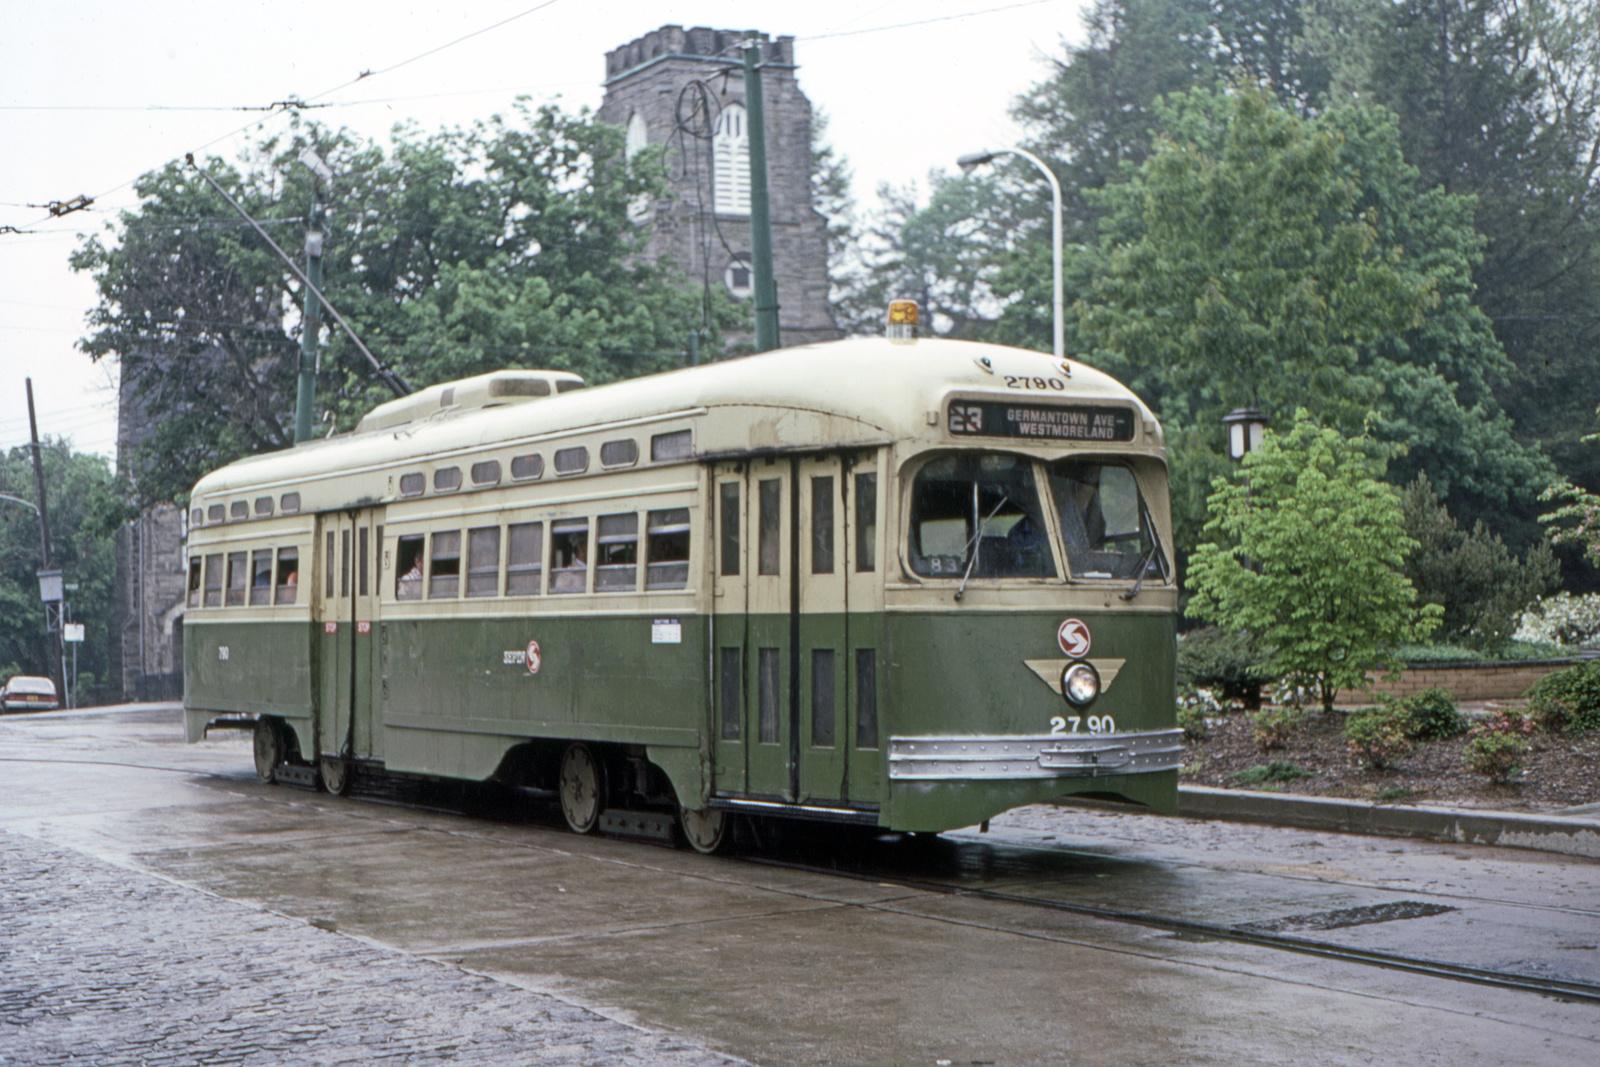 (762k, 1600x1067)<br><b>Country:</b> United States<br><b>City:</b> Philadelphia, PA<br><b>System:</b> SEPTA (or Predecessor)<br><b>Line:</b> Rt. 23-Germantown<br><b>Location:</b> Bethlehem Pike/Chestnut Hill Loop<br><b>Car:</b> PTC/SEPTA Postwar All-electric PCC (St.Louis, 1947) 2790 <br><b>Collection of:</b> David Pirmann<br><b>Date:</b> 5/22/1983<br><b>Viewed (this week/total):</b> 1 / 57